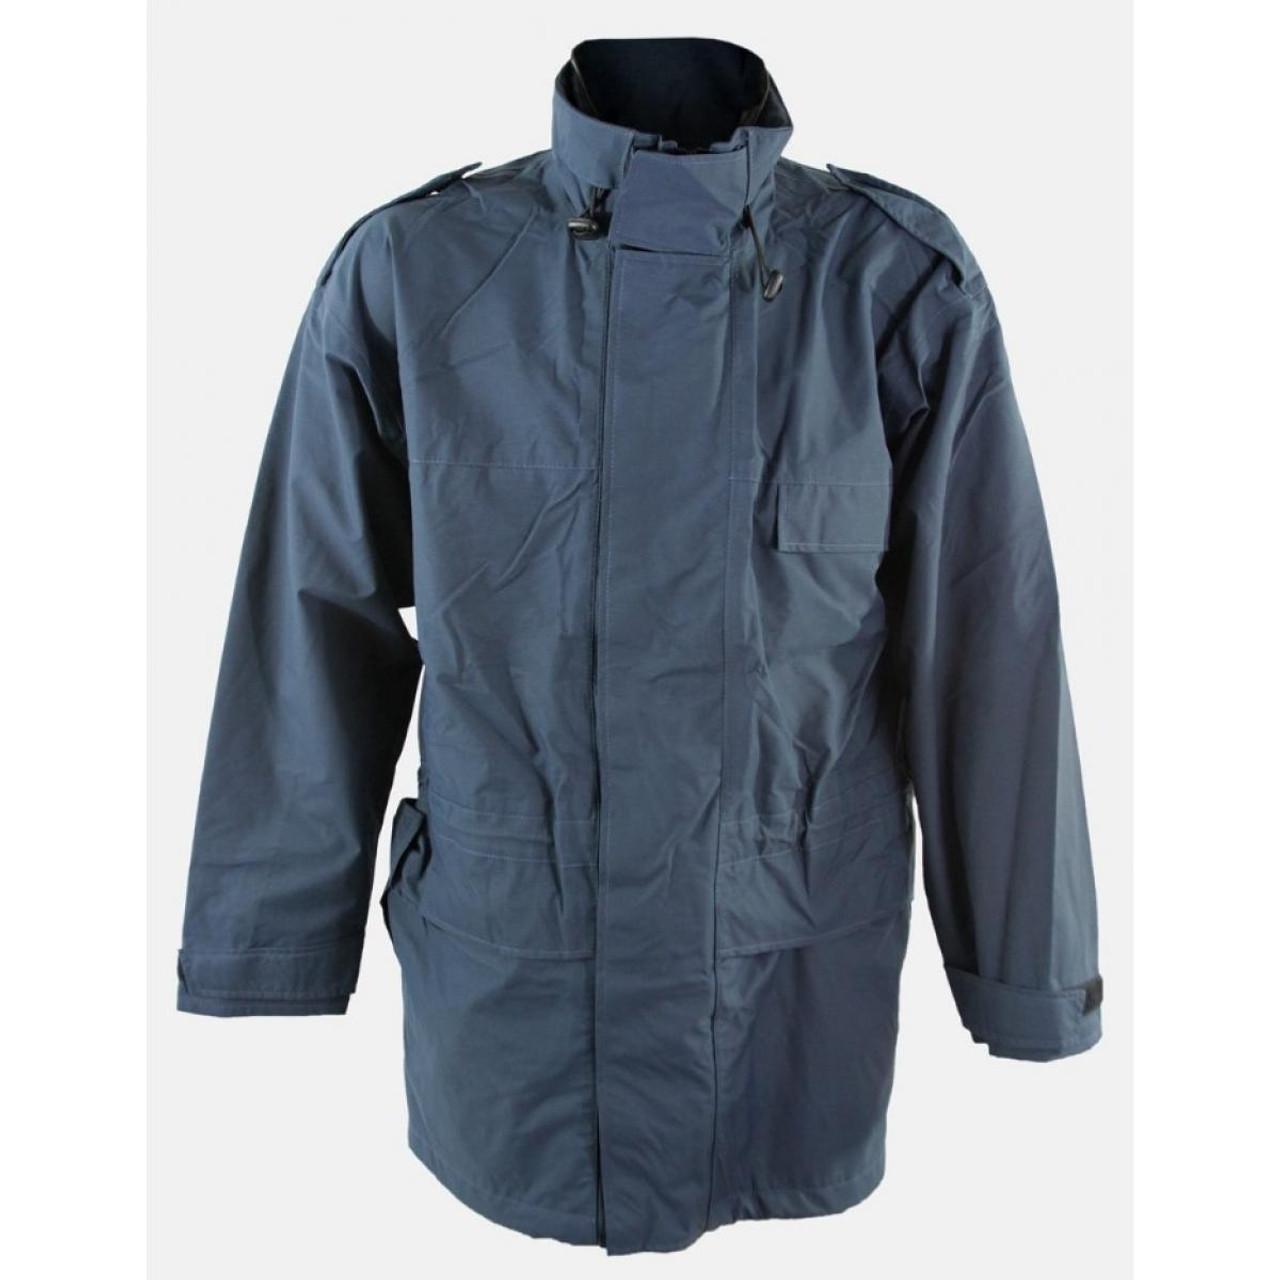 Surplus British RAF Blue Rain Jacket